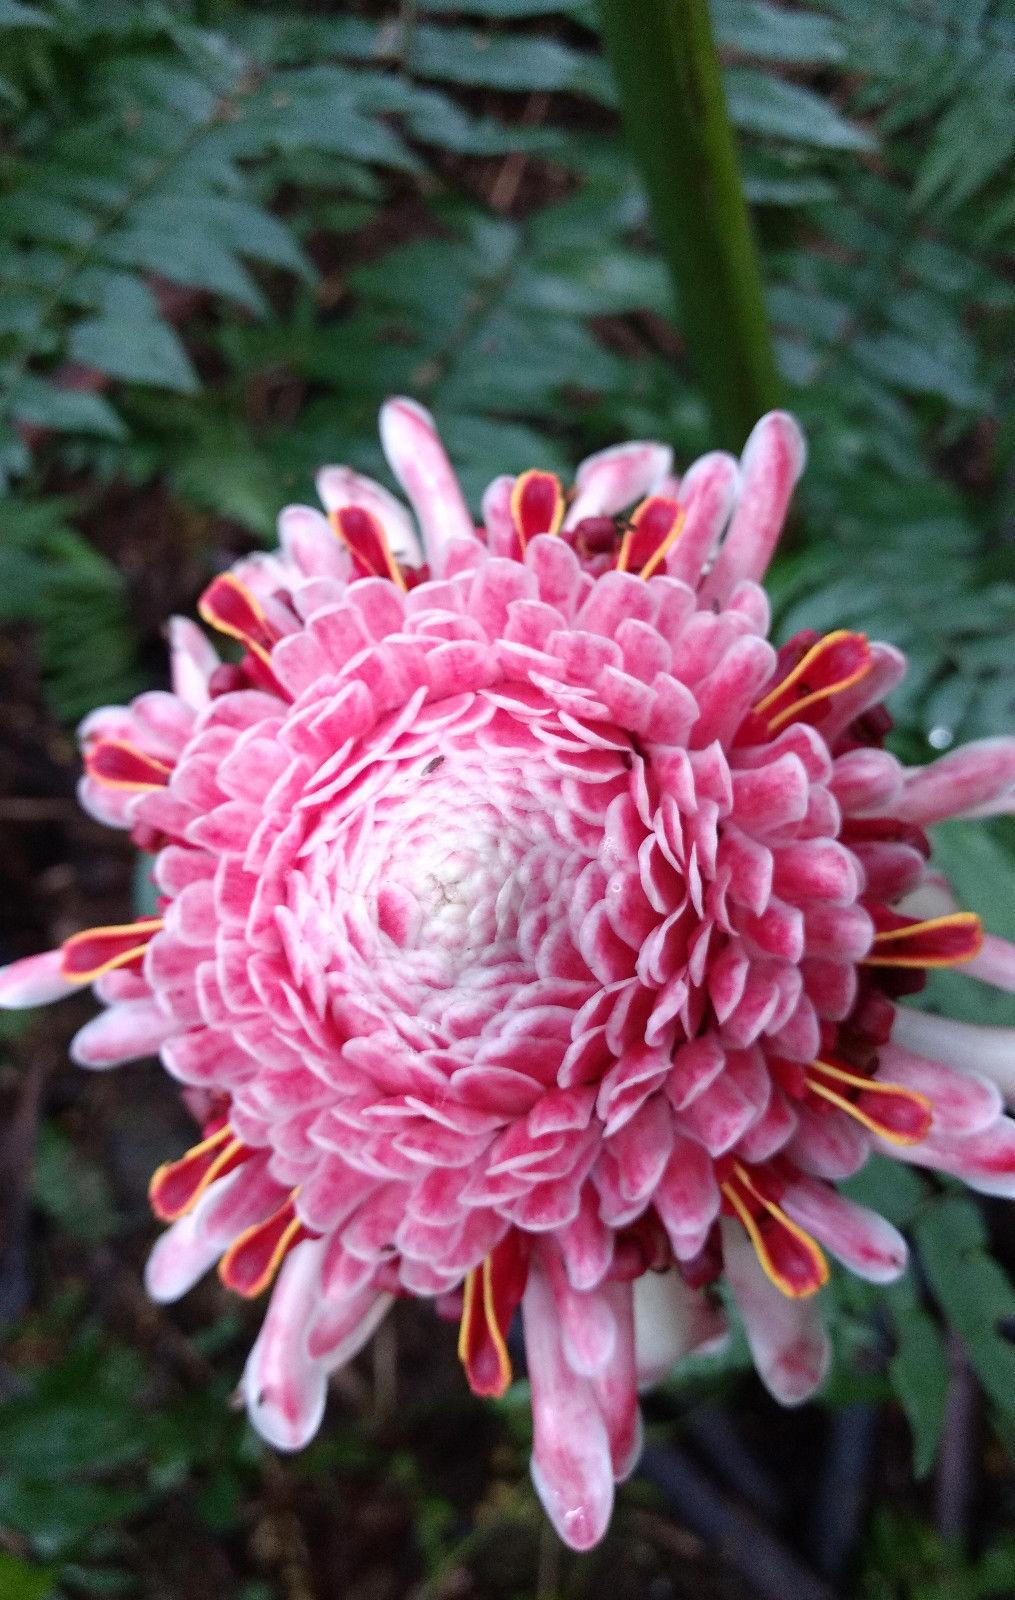 Rare Etlingera elatior Pink Torch Ginger Large Plant Rhizome tropical flower image 3